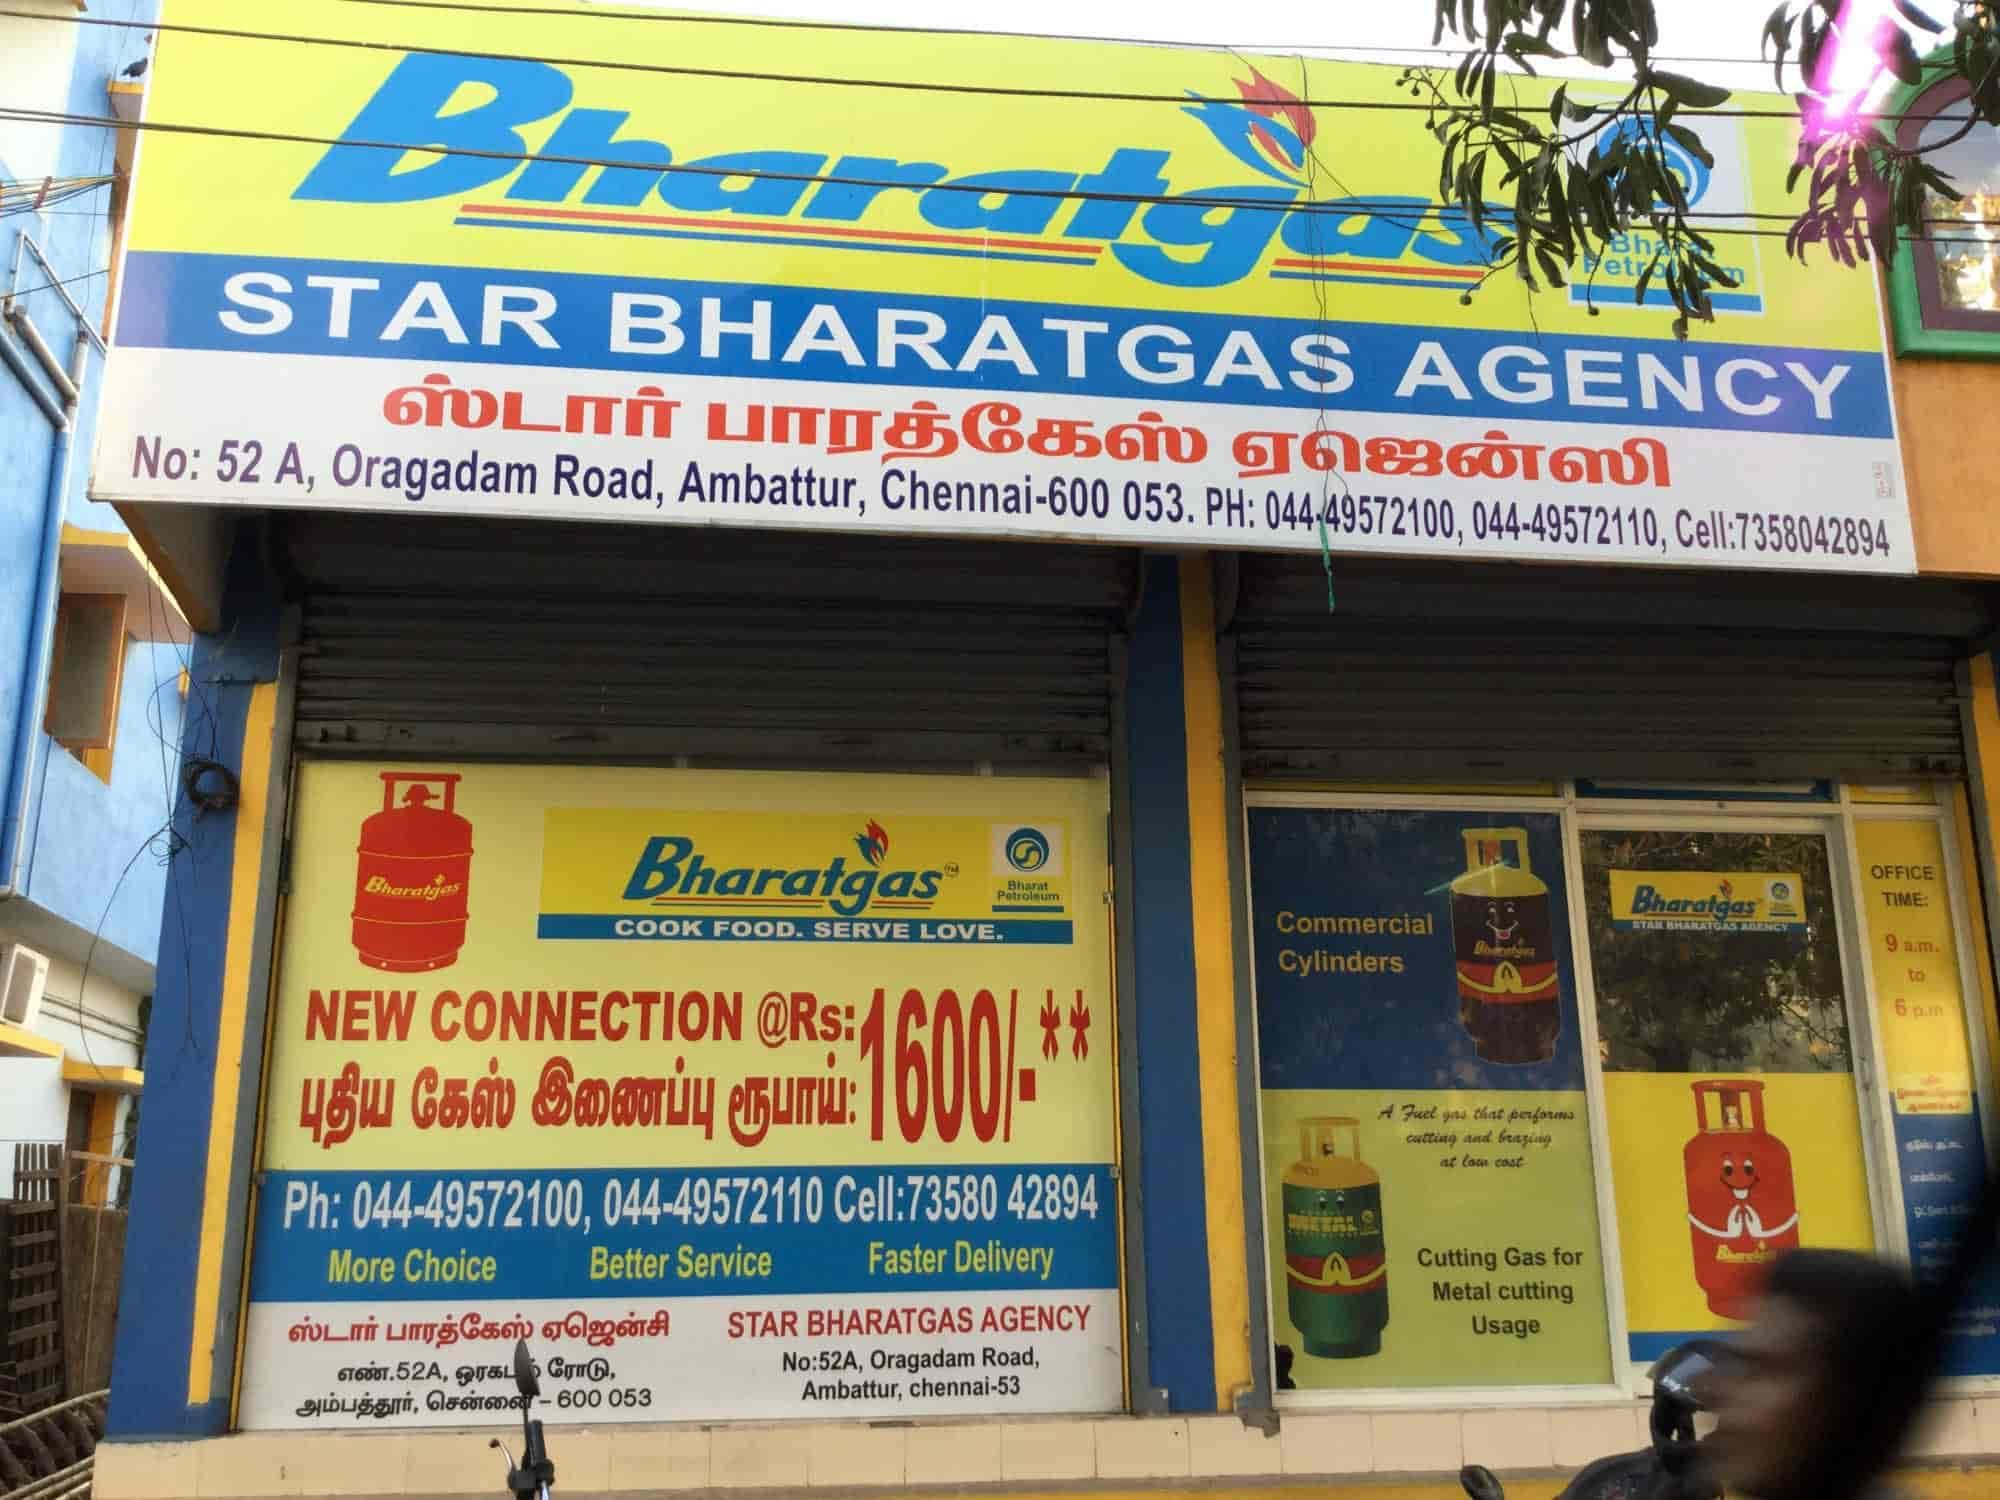 Star Bharat Gas Photos, Ambattur, Chennai- Pictures & Images Gallery